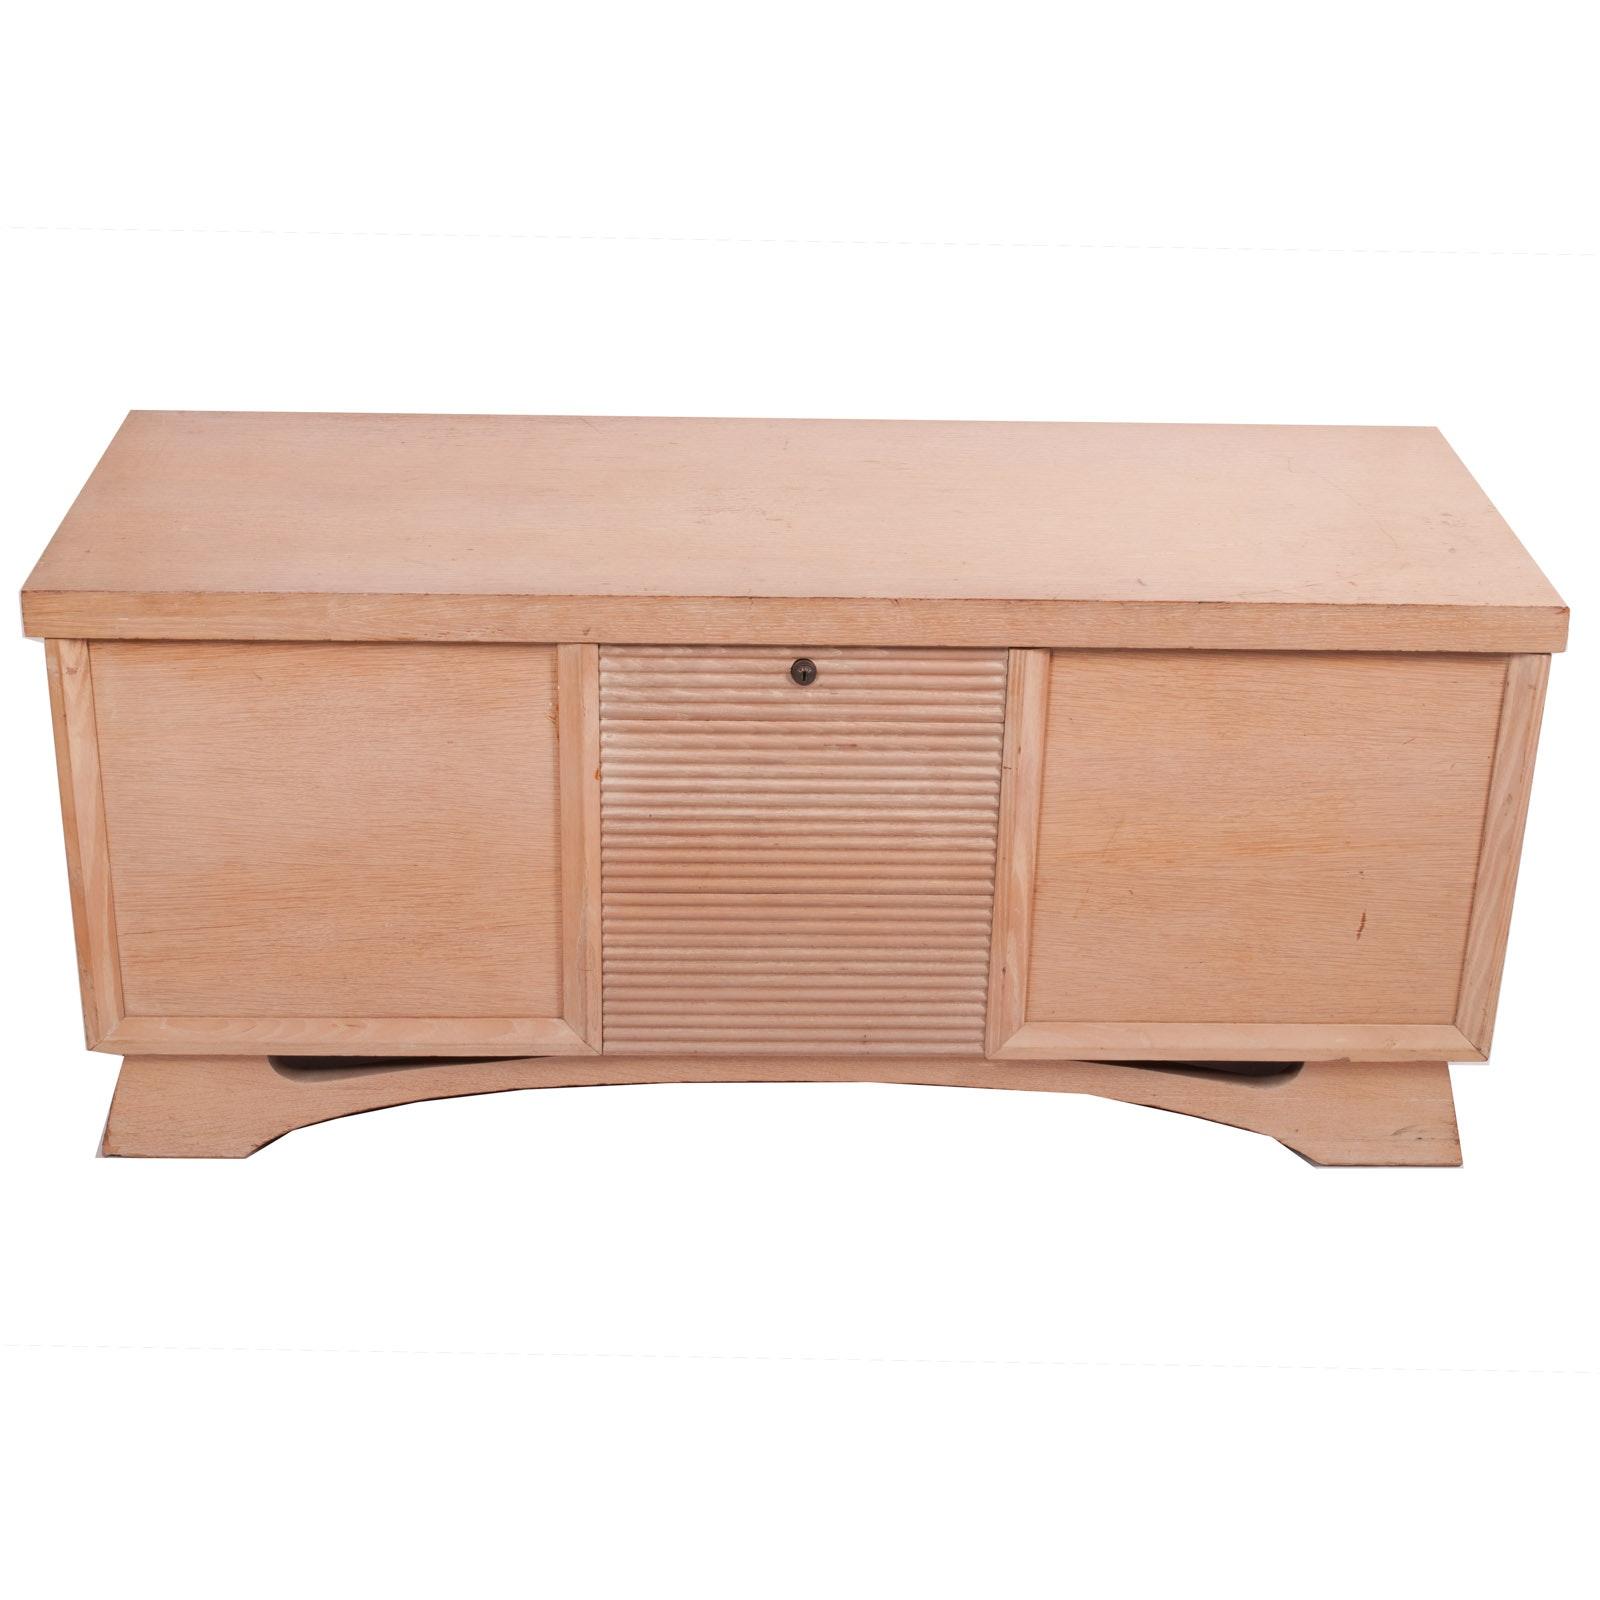 Vintage Cedar Chest by Lane Furniture